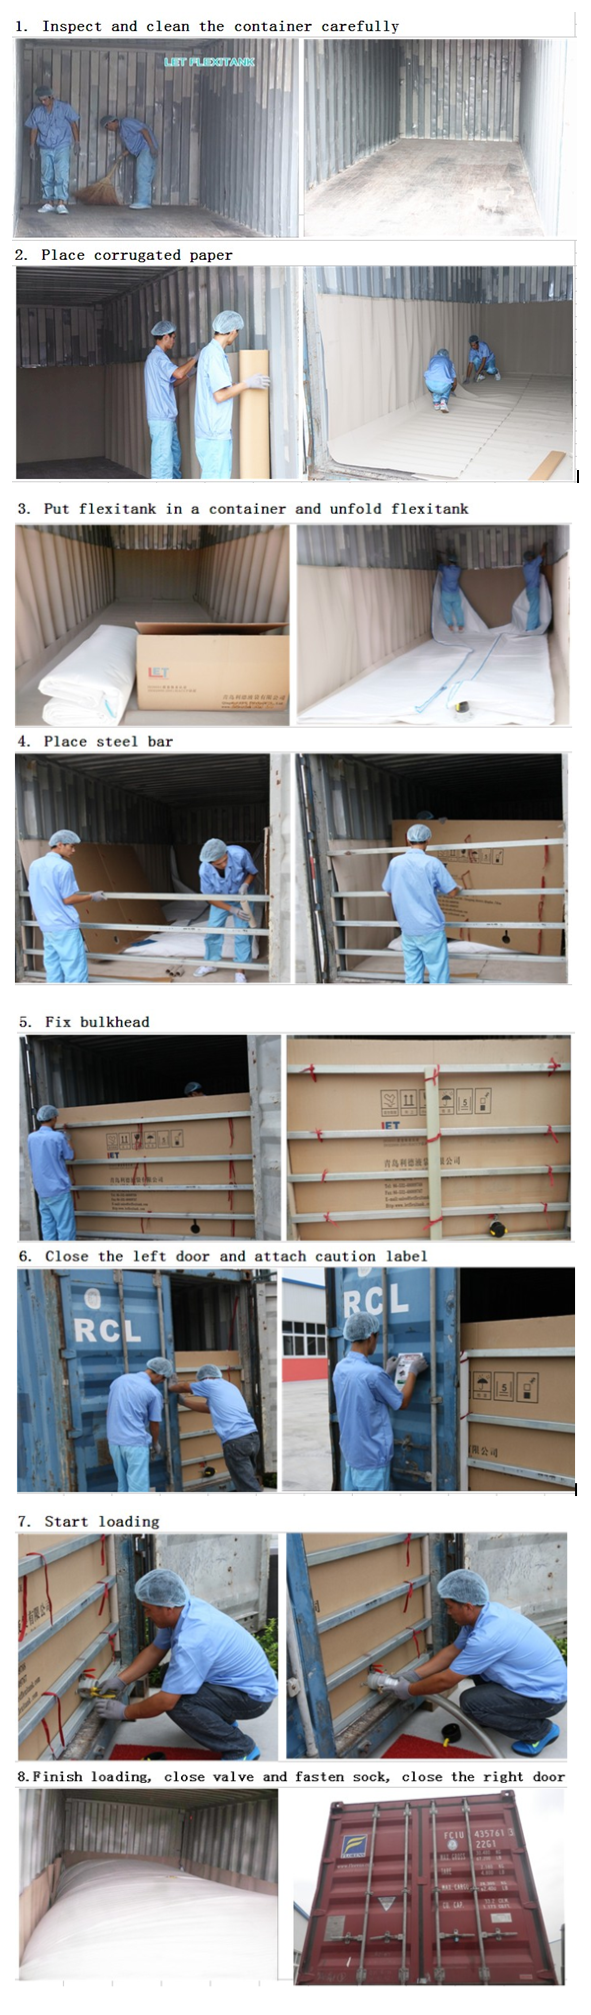 Bulk Chemical Liquid products transport  flexible package bag flexitank flexi bag container